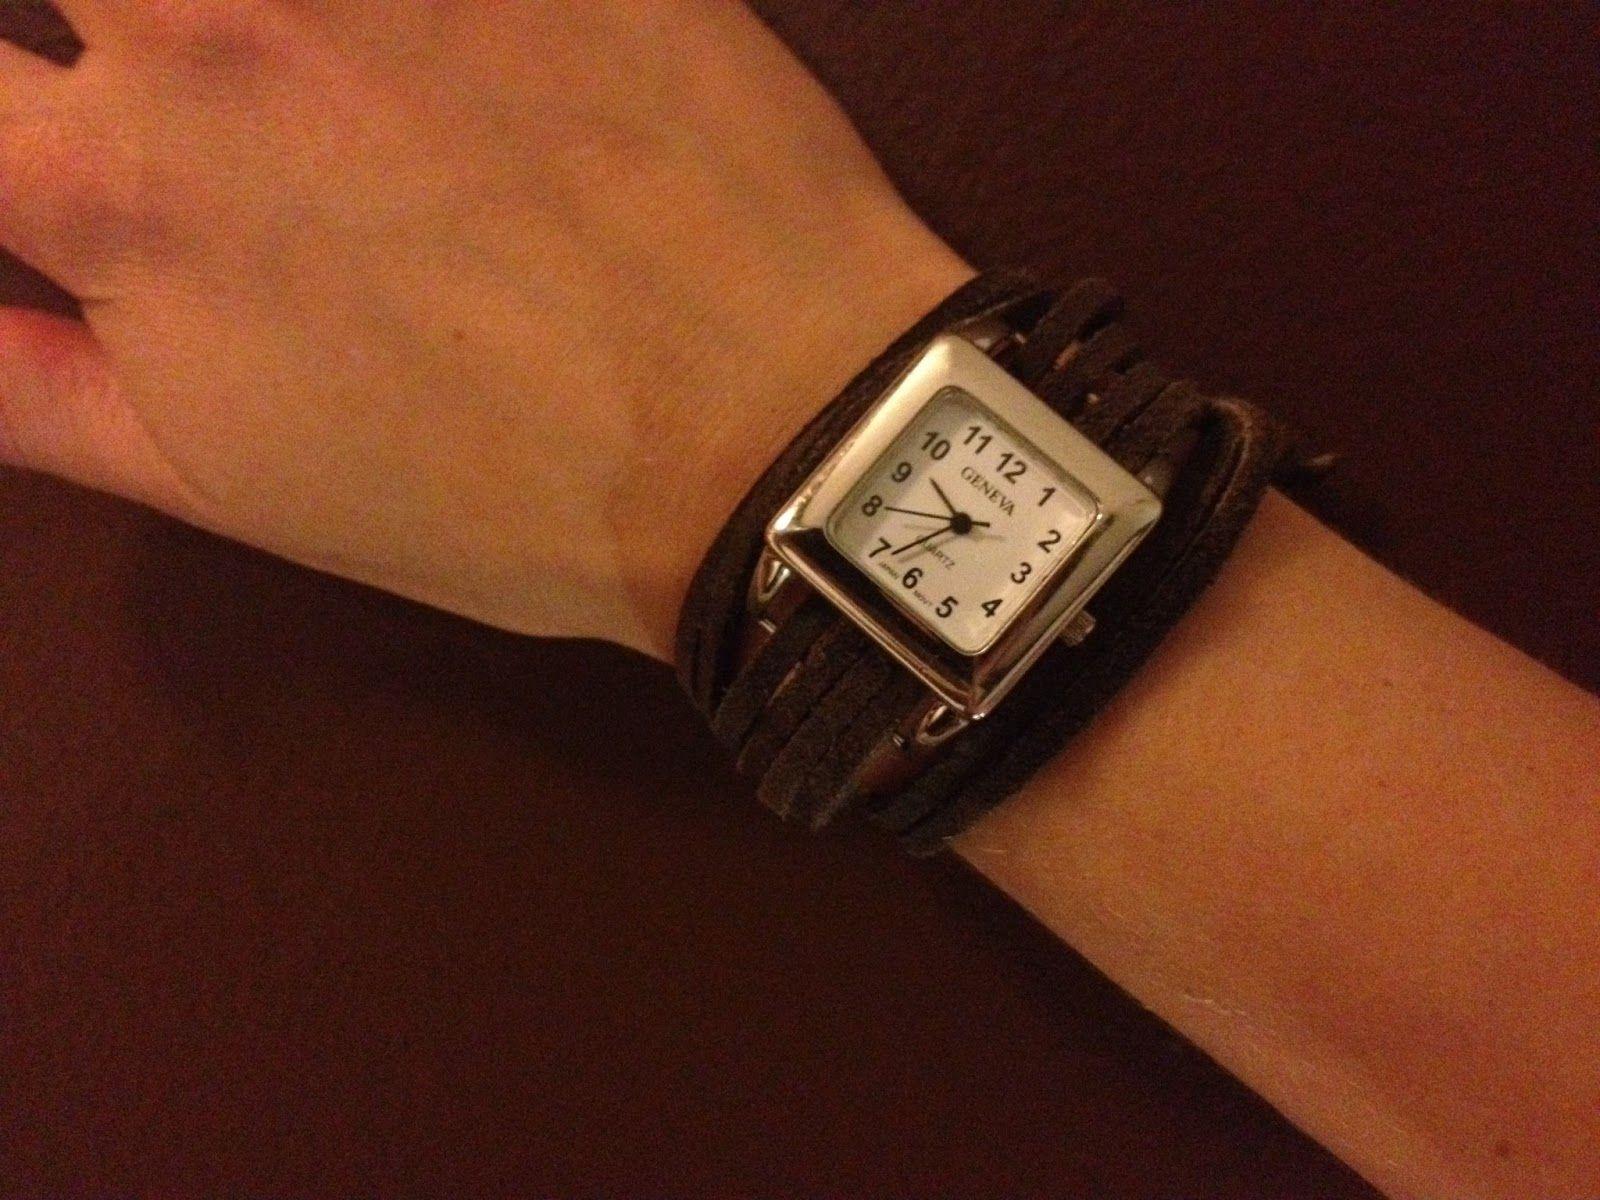 Diy Suede Band Bracelet Watch Diy Watch Band Band Bracelet